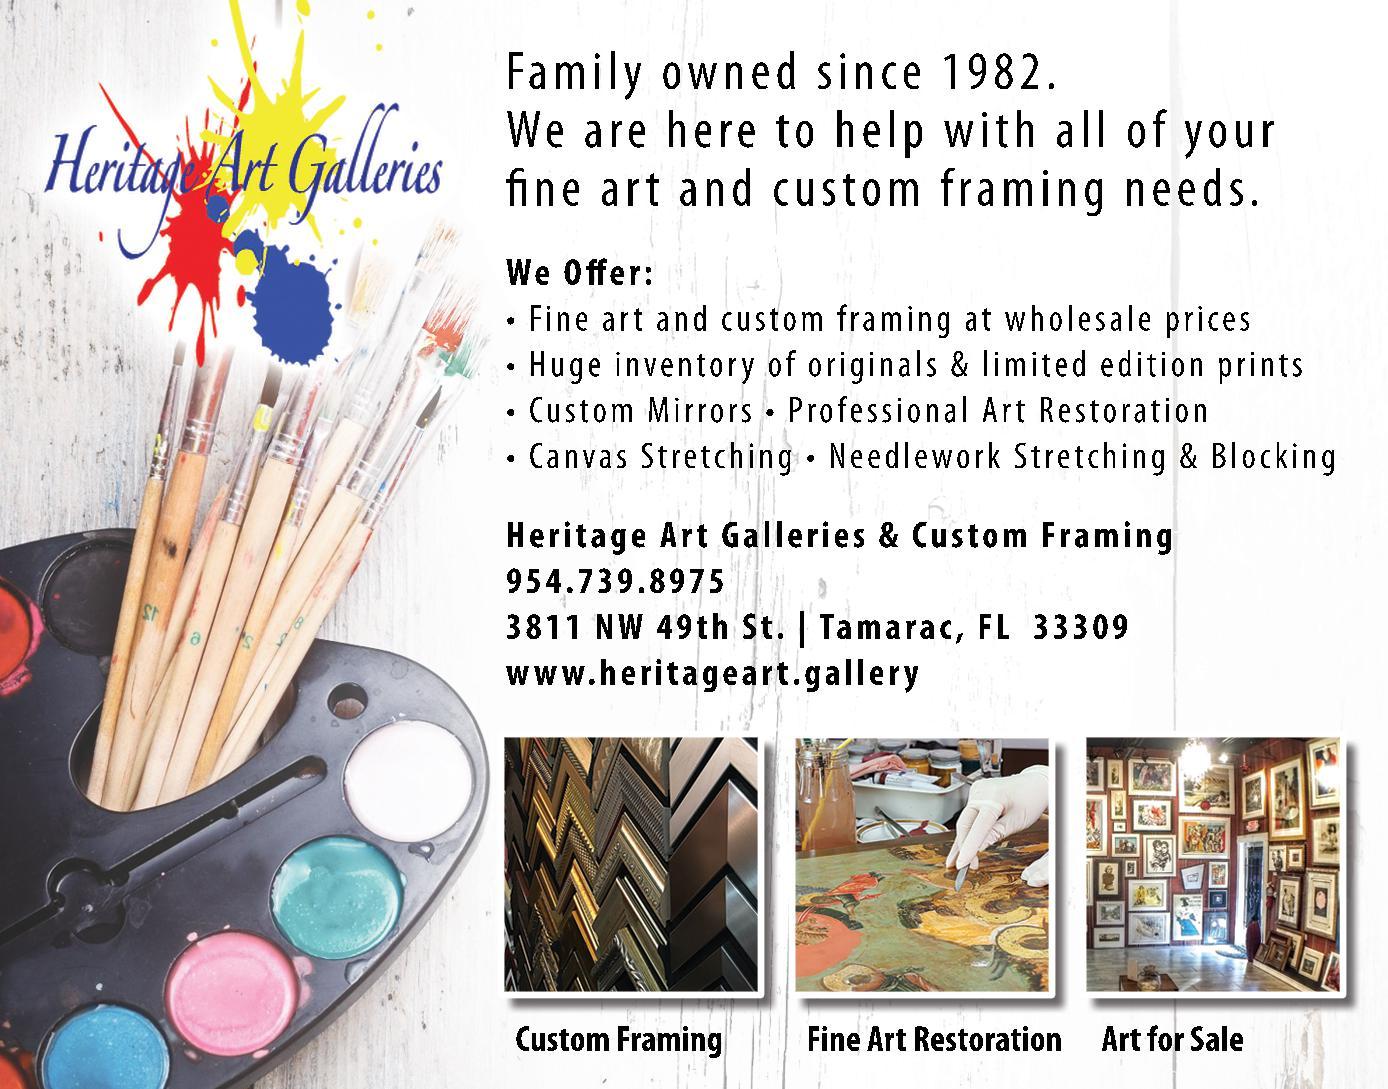 Heritage Art Galleries Inc.